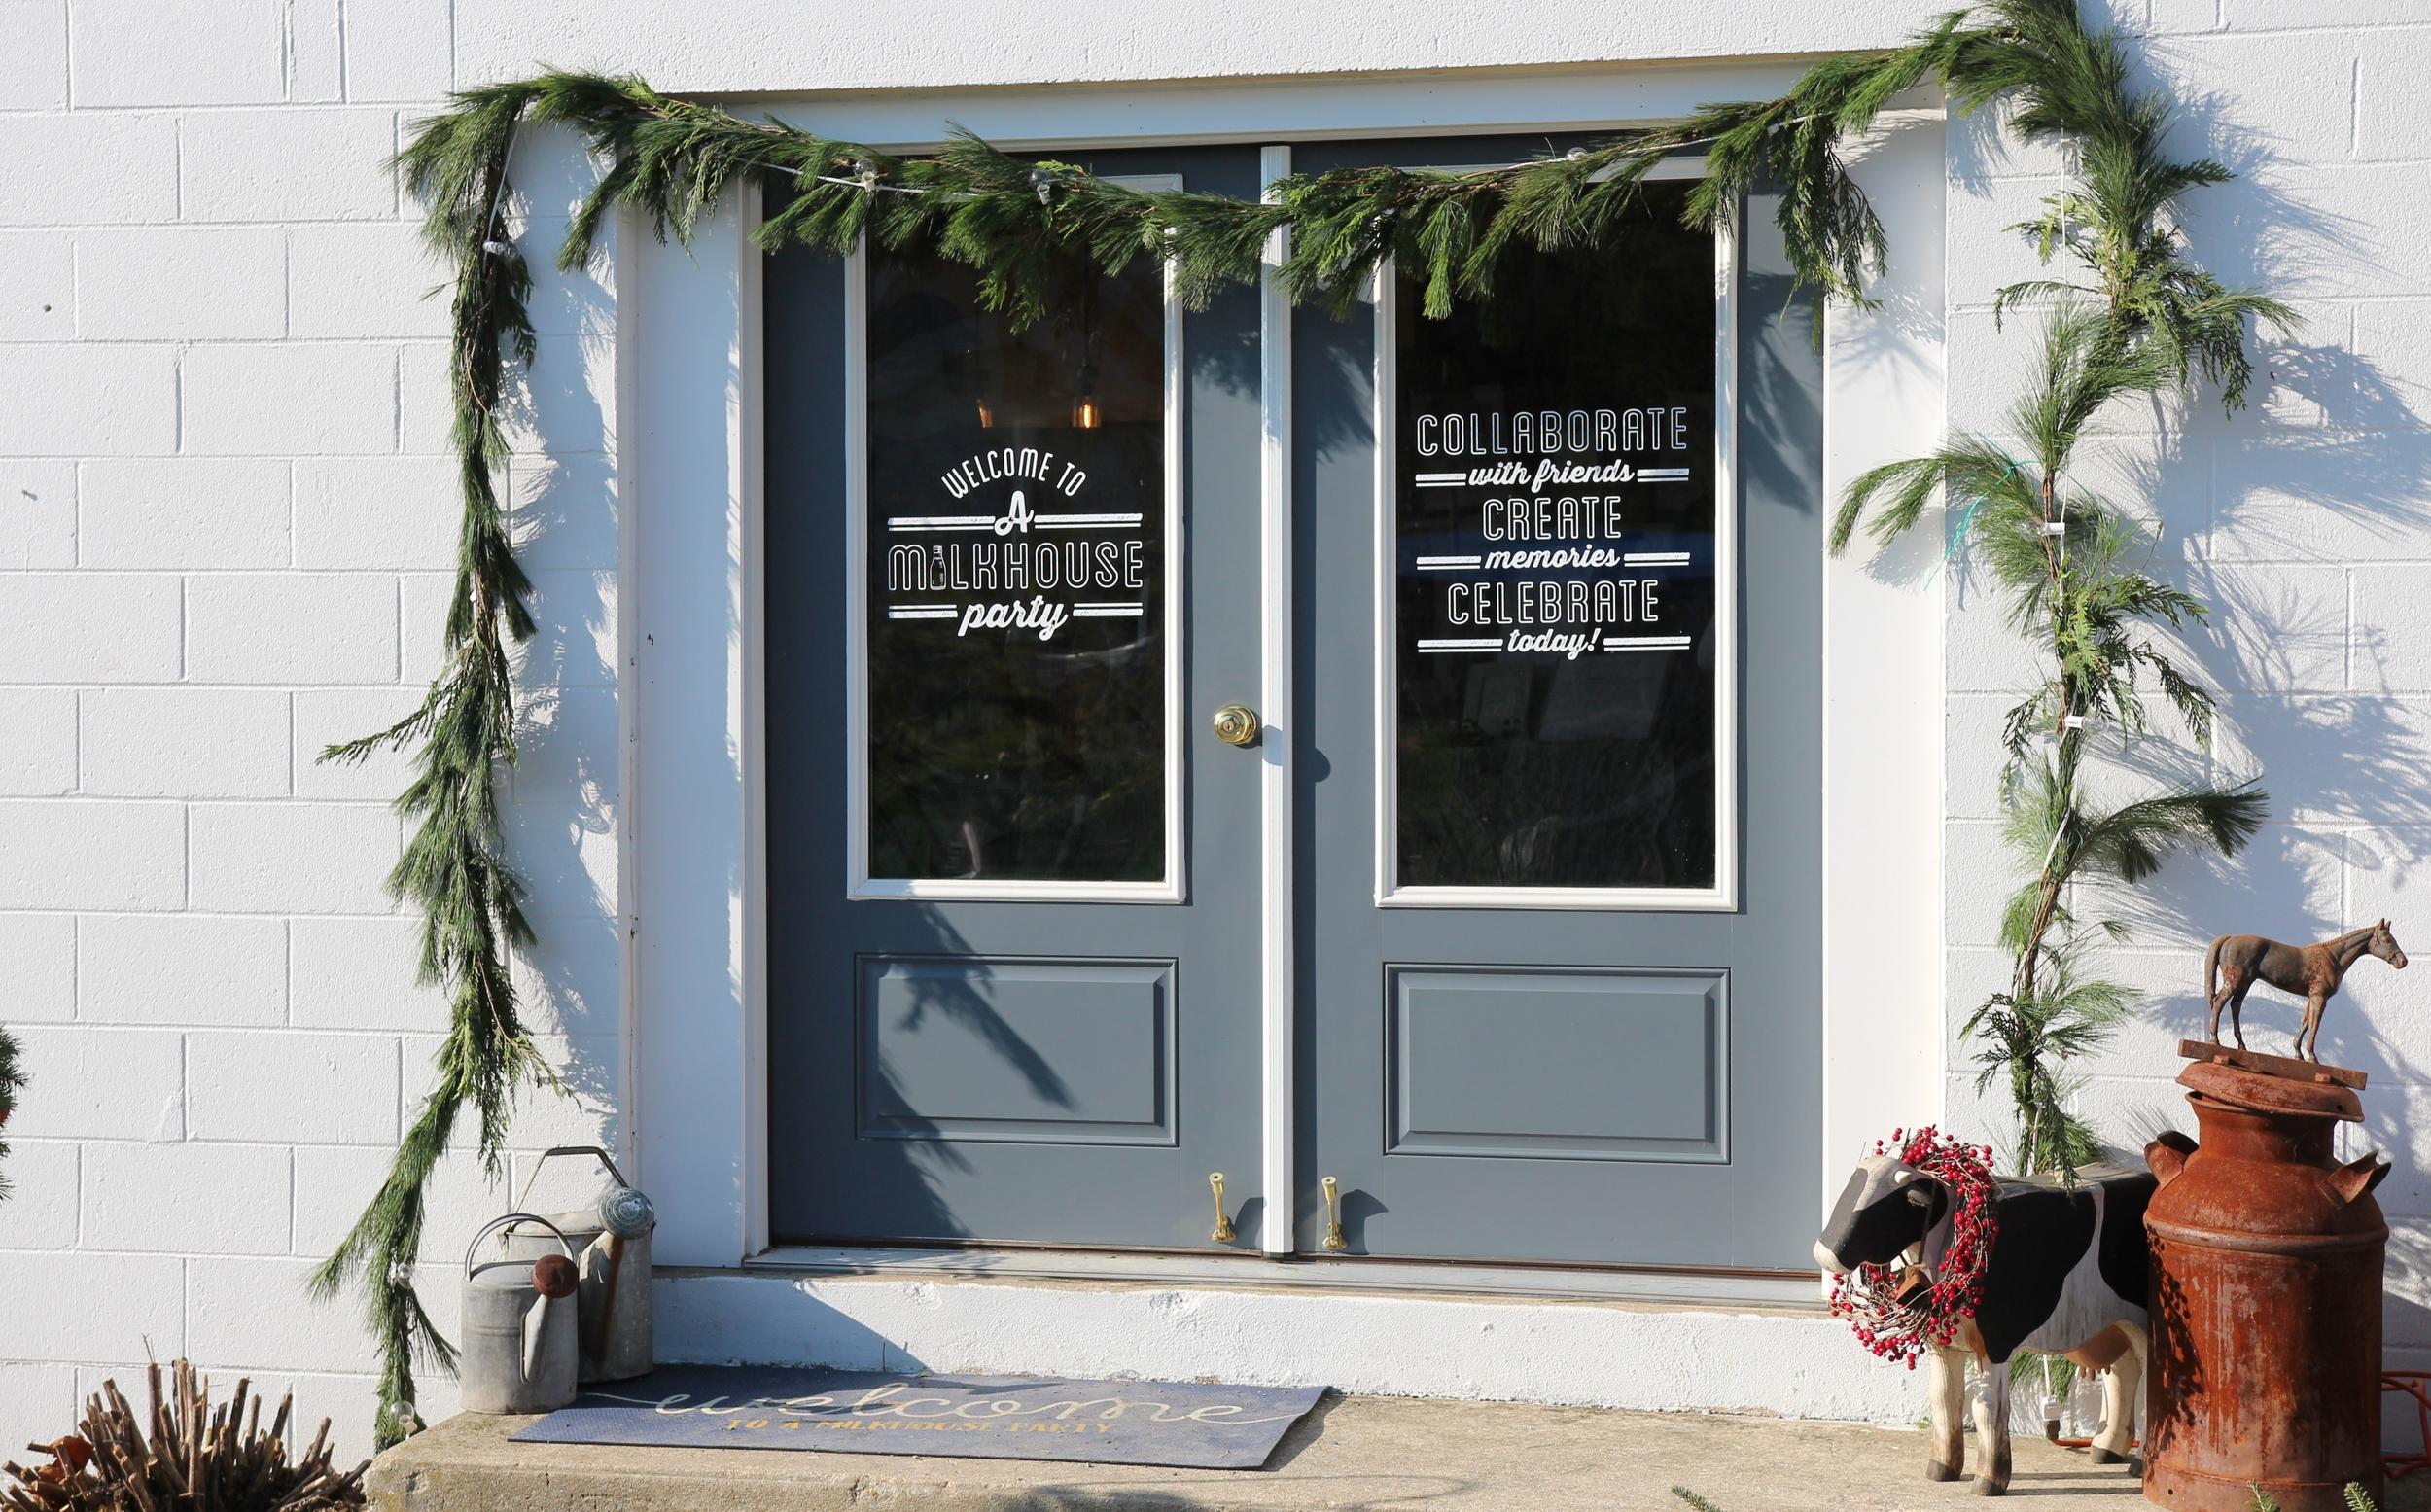 A Garden Party, A Milkhouse Party, Holiday Open House